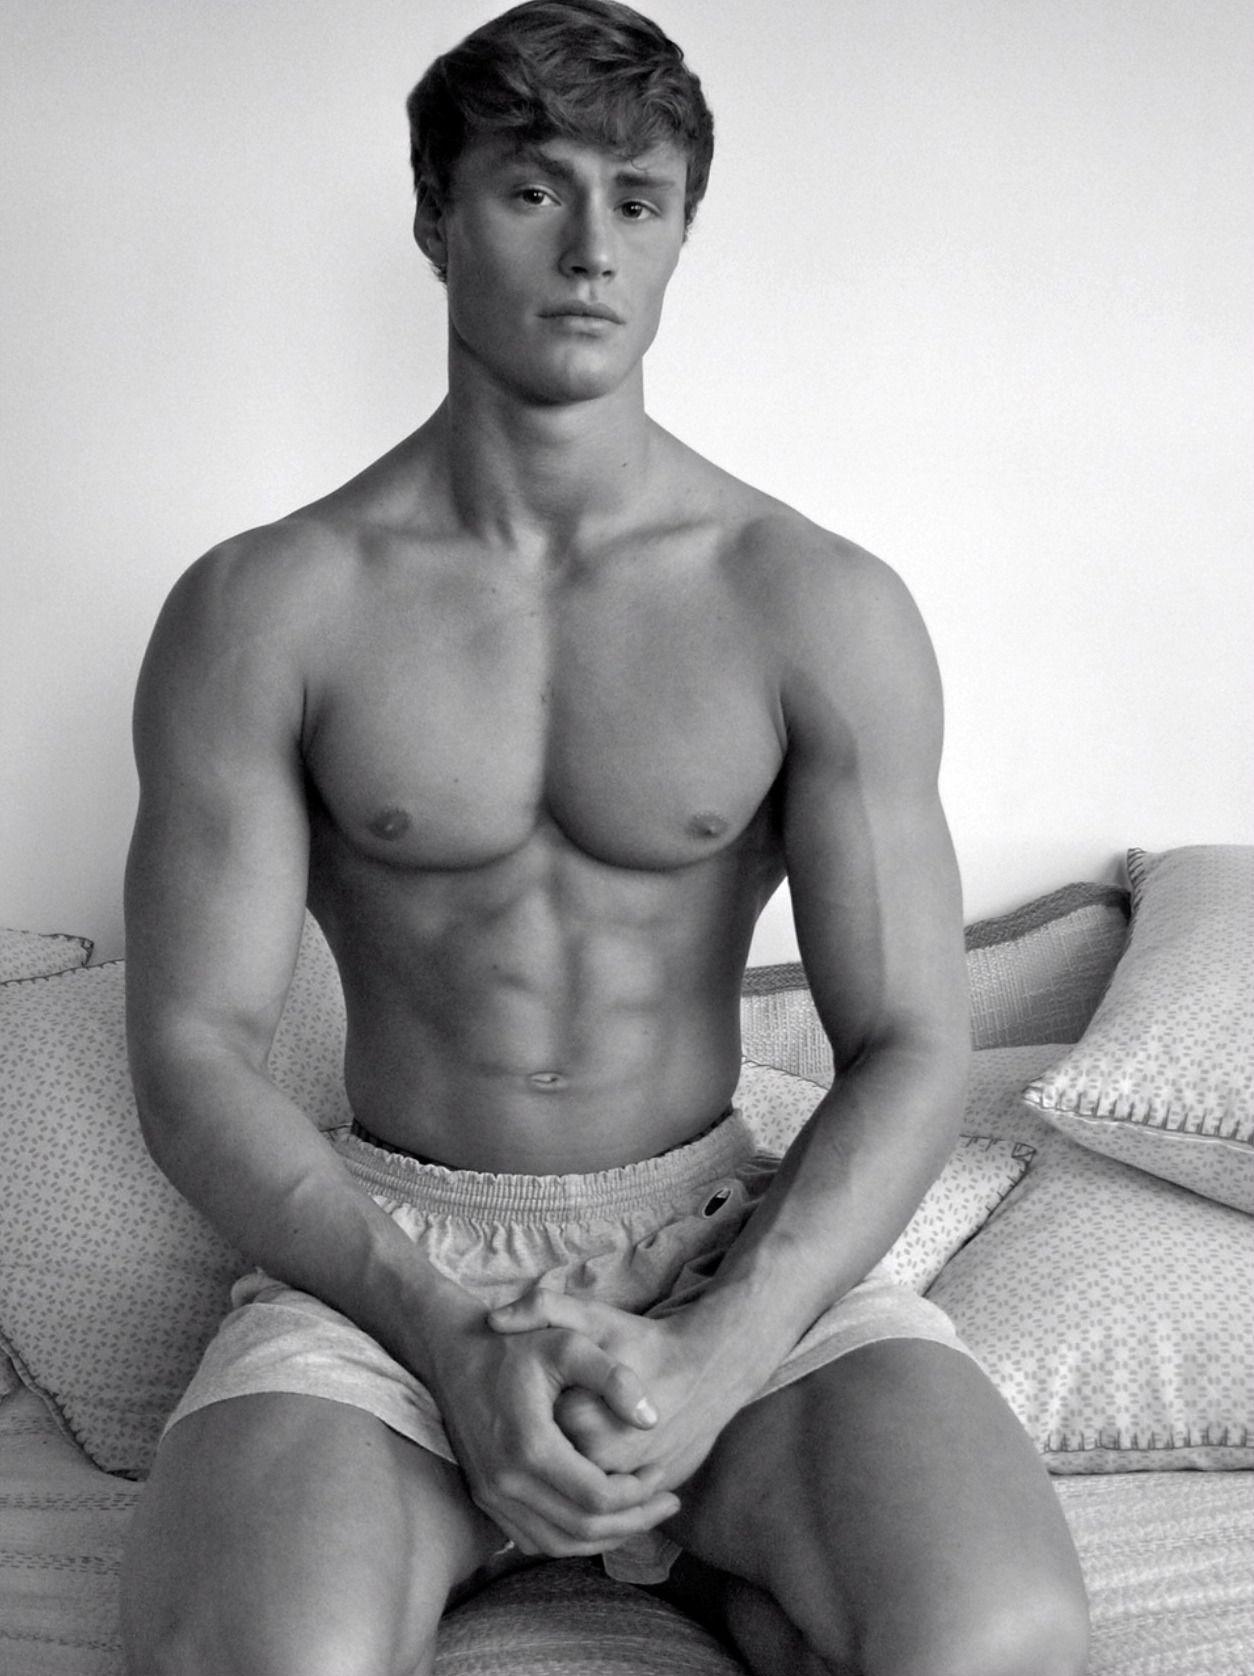 David Laid | Beautiful Males VI | Pinterest | Male